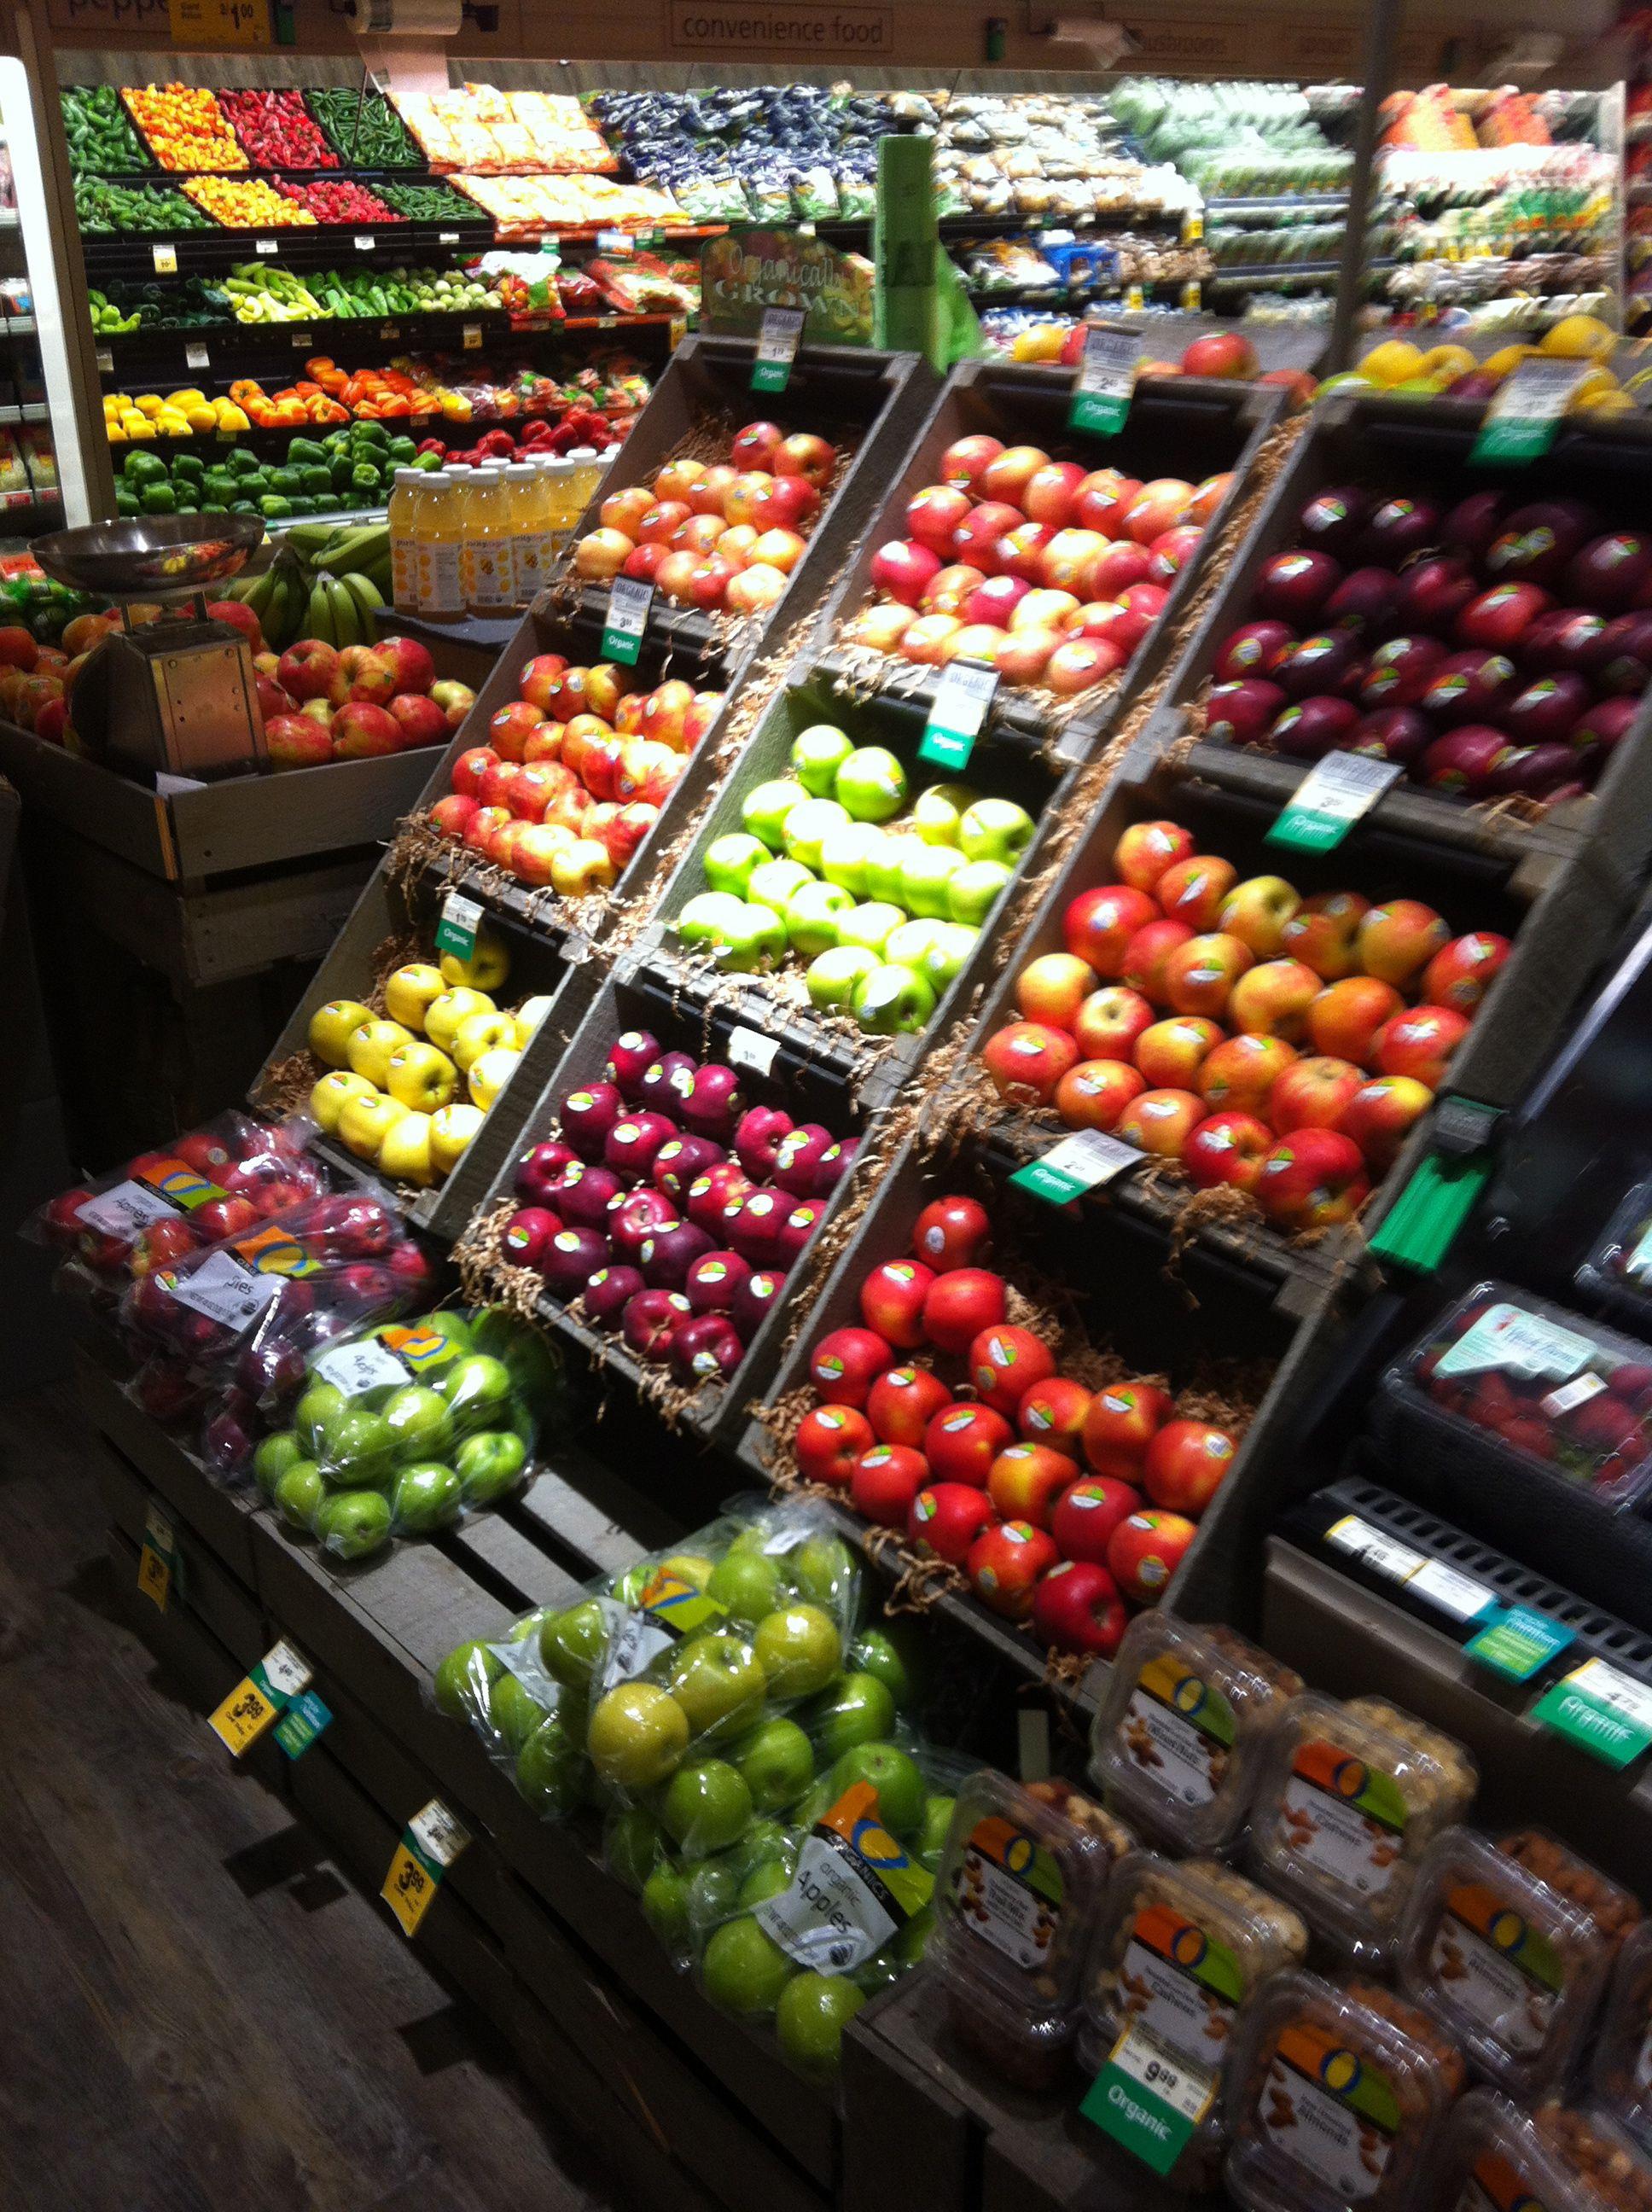 Rainbow display of fresh produce supermarkets